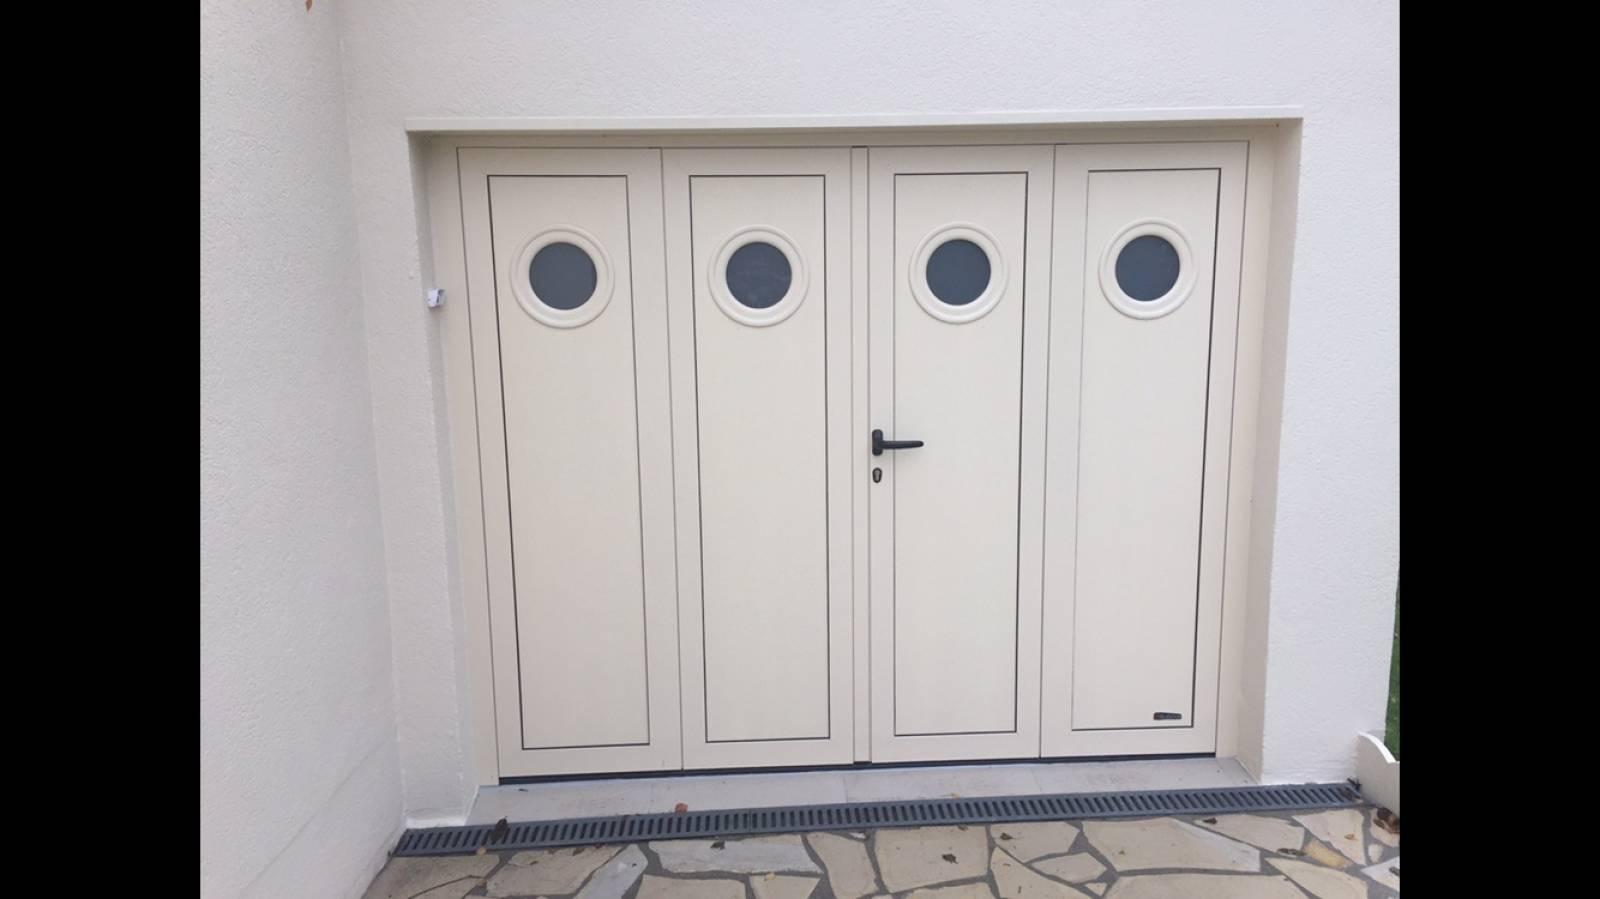 Vente et pose de porte de garage de qualit proche bolbec for Porte de garage pose en tunnel